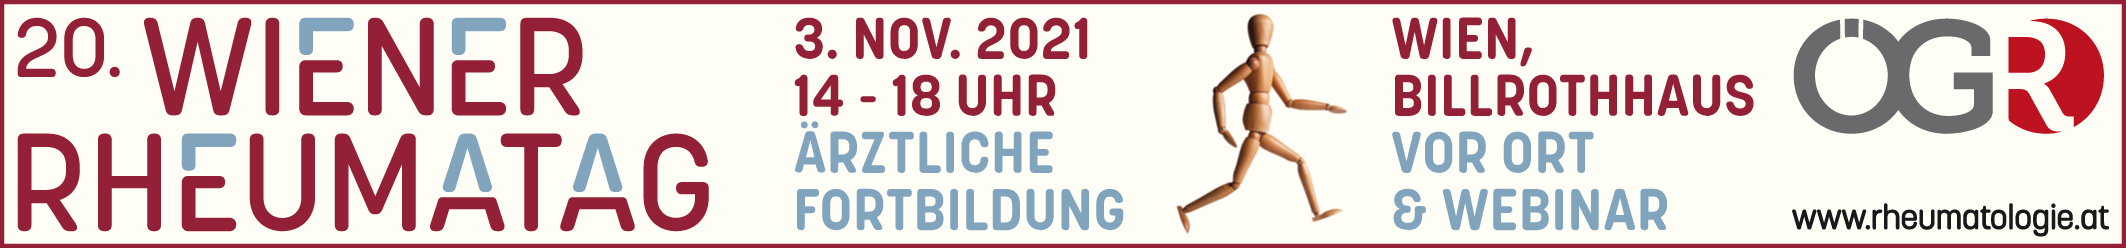 20. Wiener Rheumatag 2021